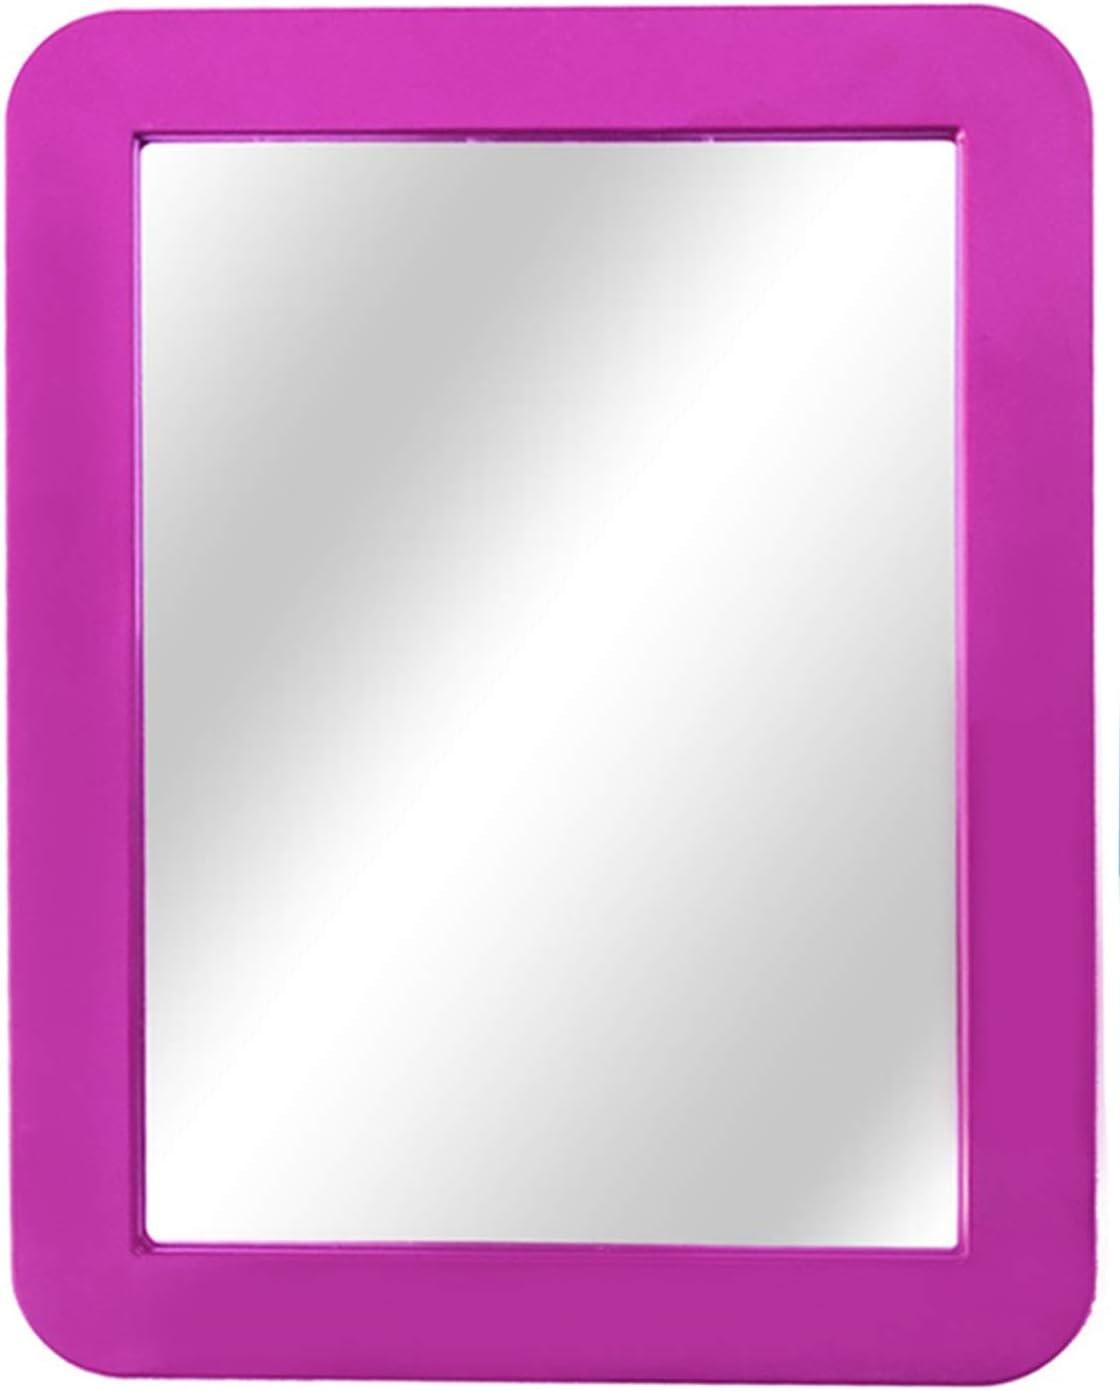 "Magnetic Locker Mirror, School Locker, Whiteboard, Gym Locker, Refrigerator, Office Cabinet, Magnetic Makeup Mirrors, Locker Accessory, Toolbox, 5"" x 7"", Pink"